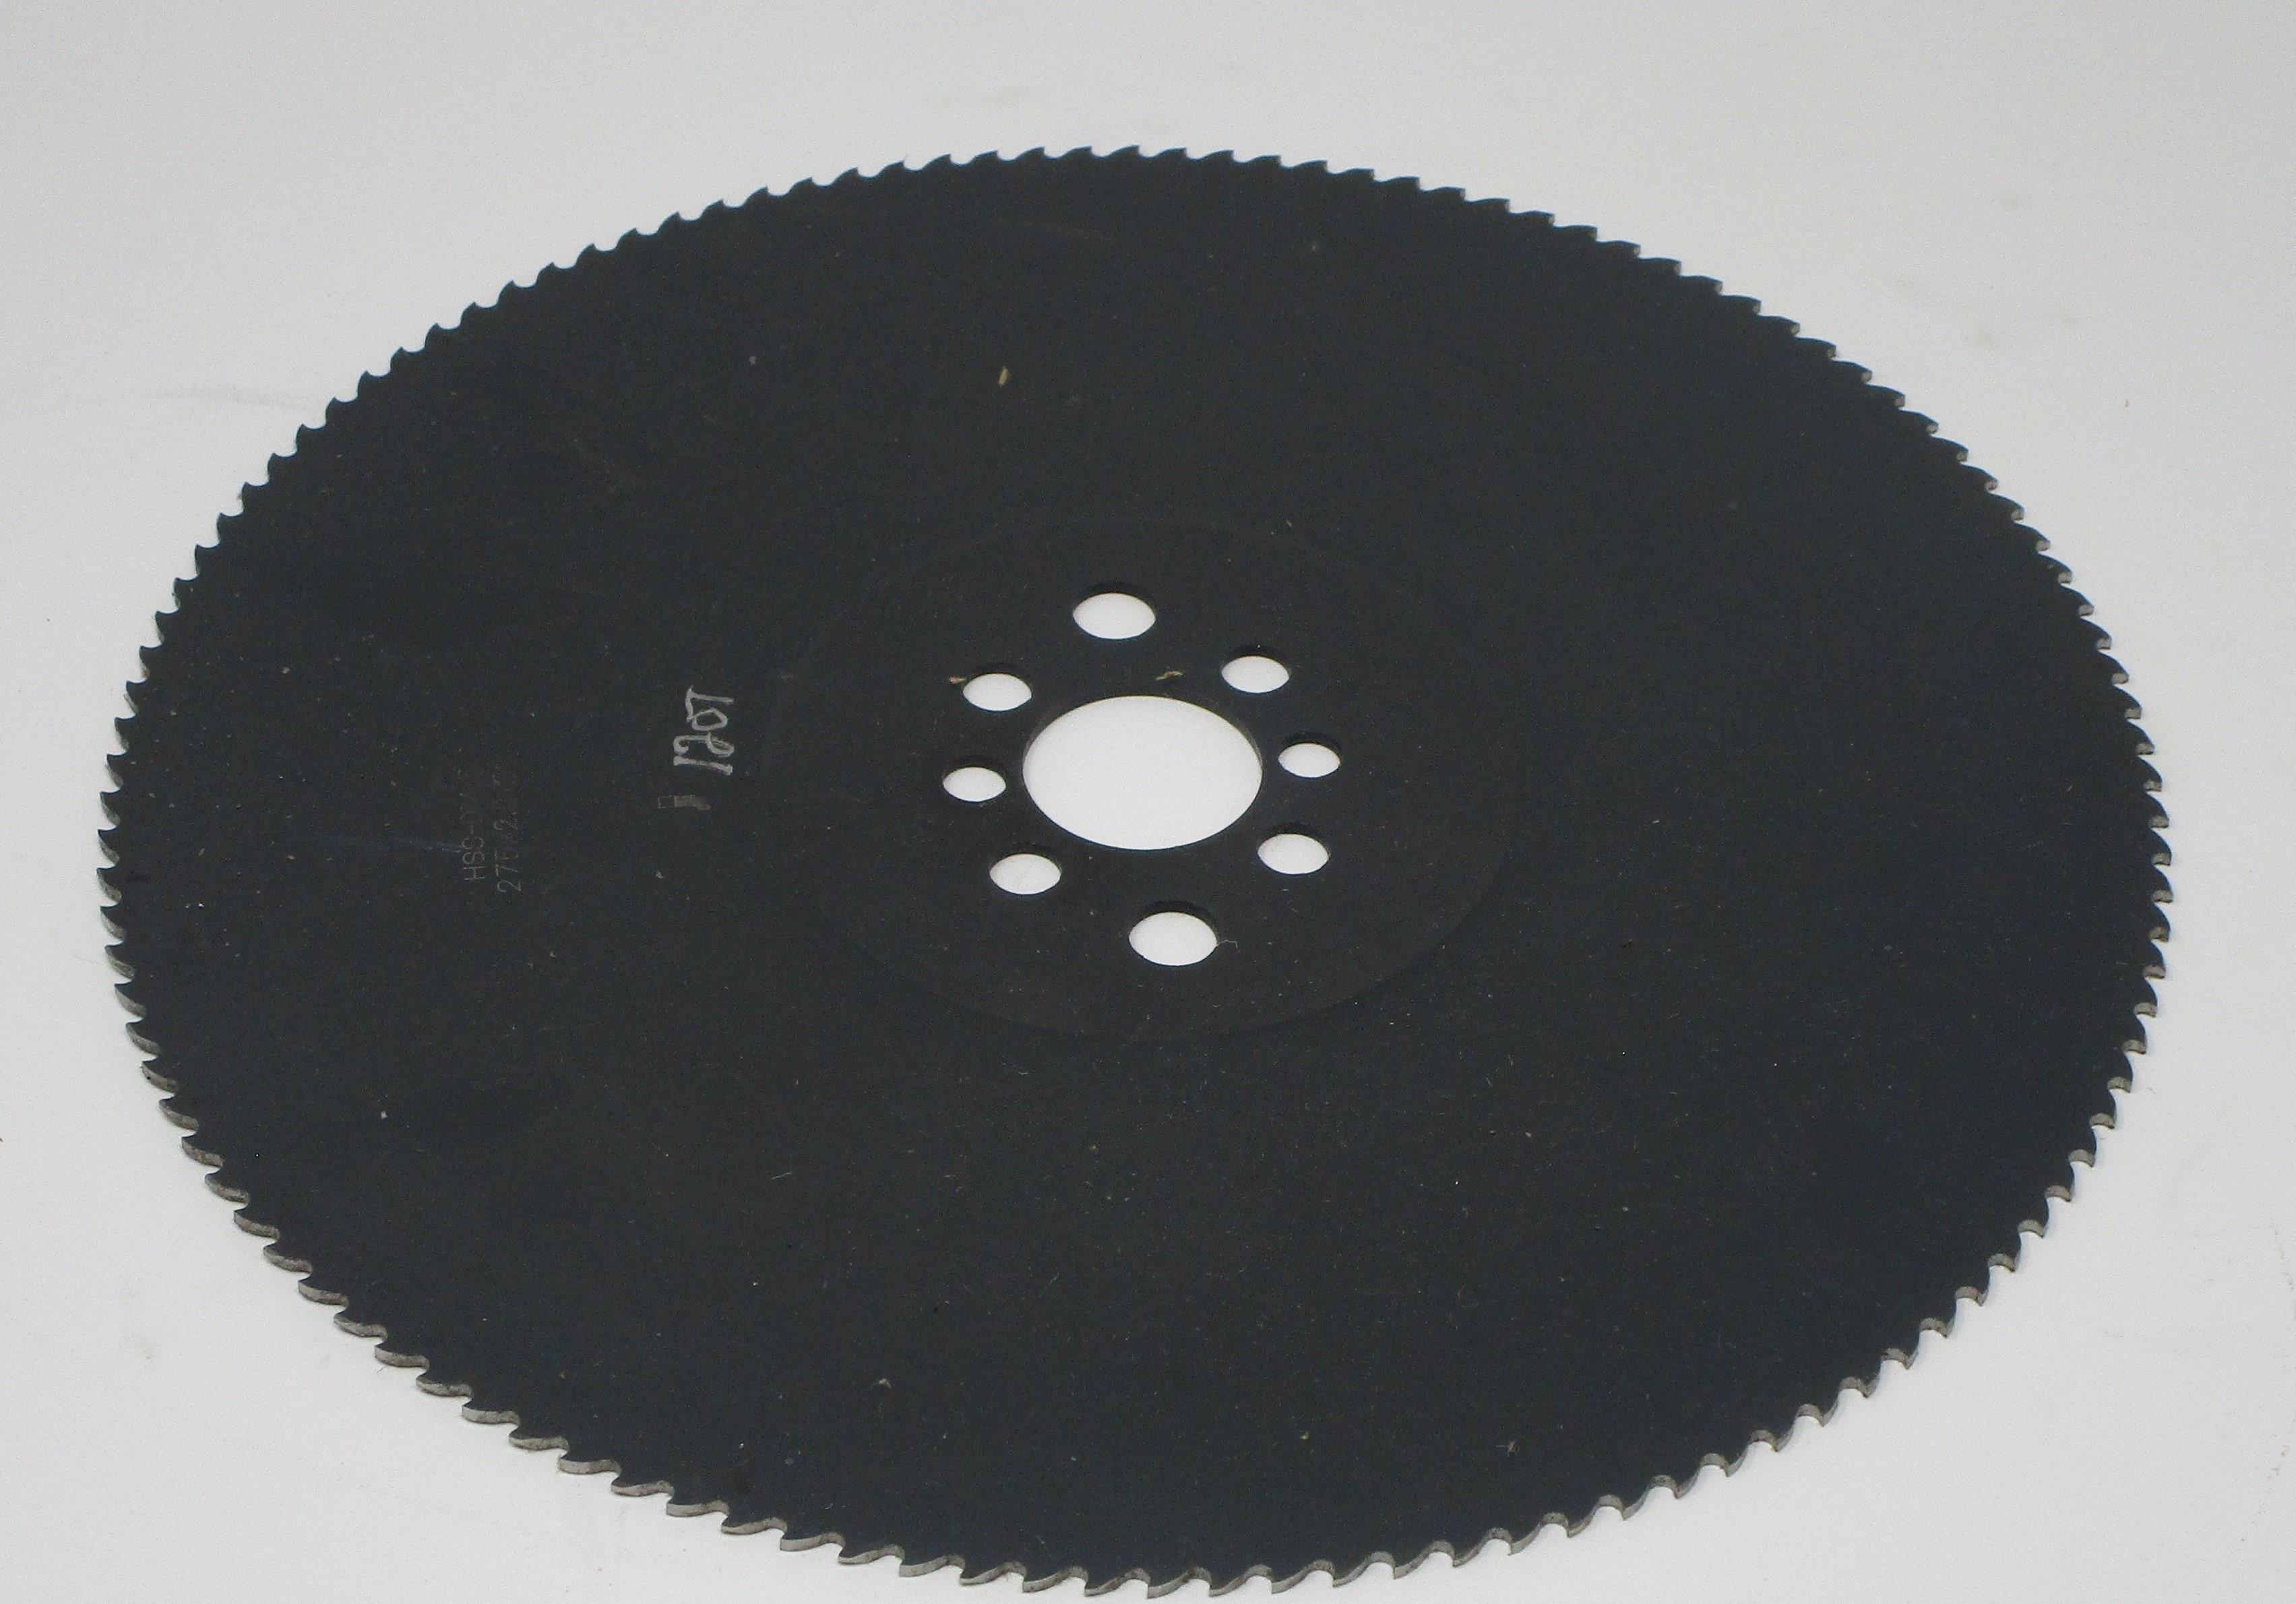 Ferrous High Speed Steel Circular Saw Blade 275mm x 32mm x 2mm x 120T For CS-275/-1